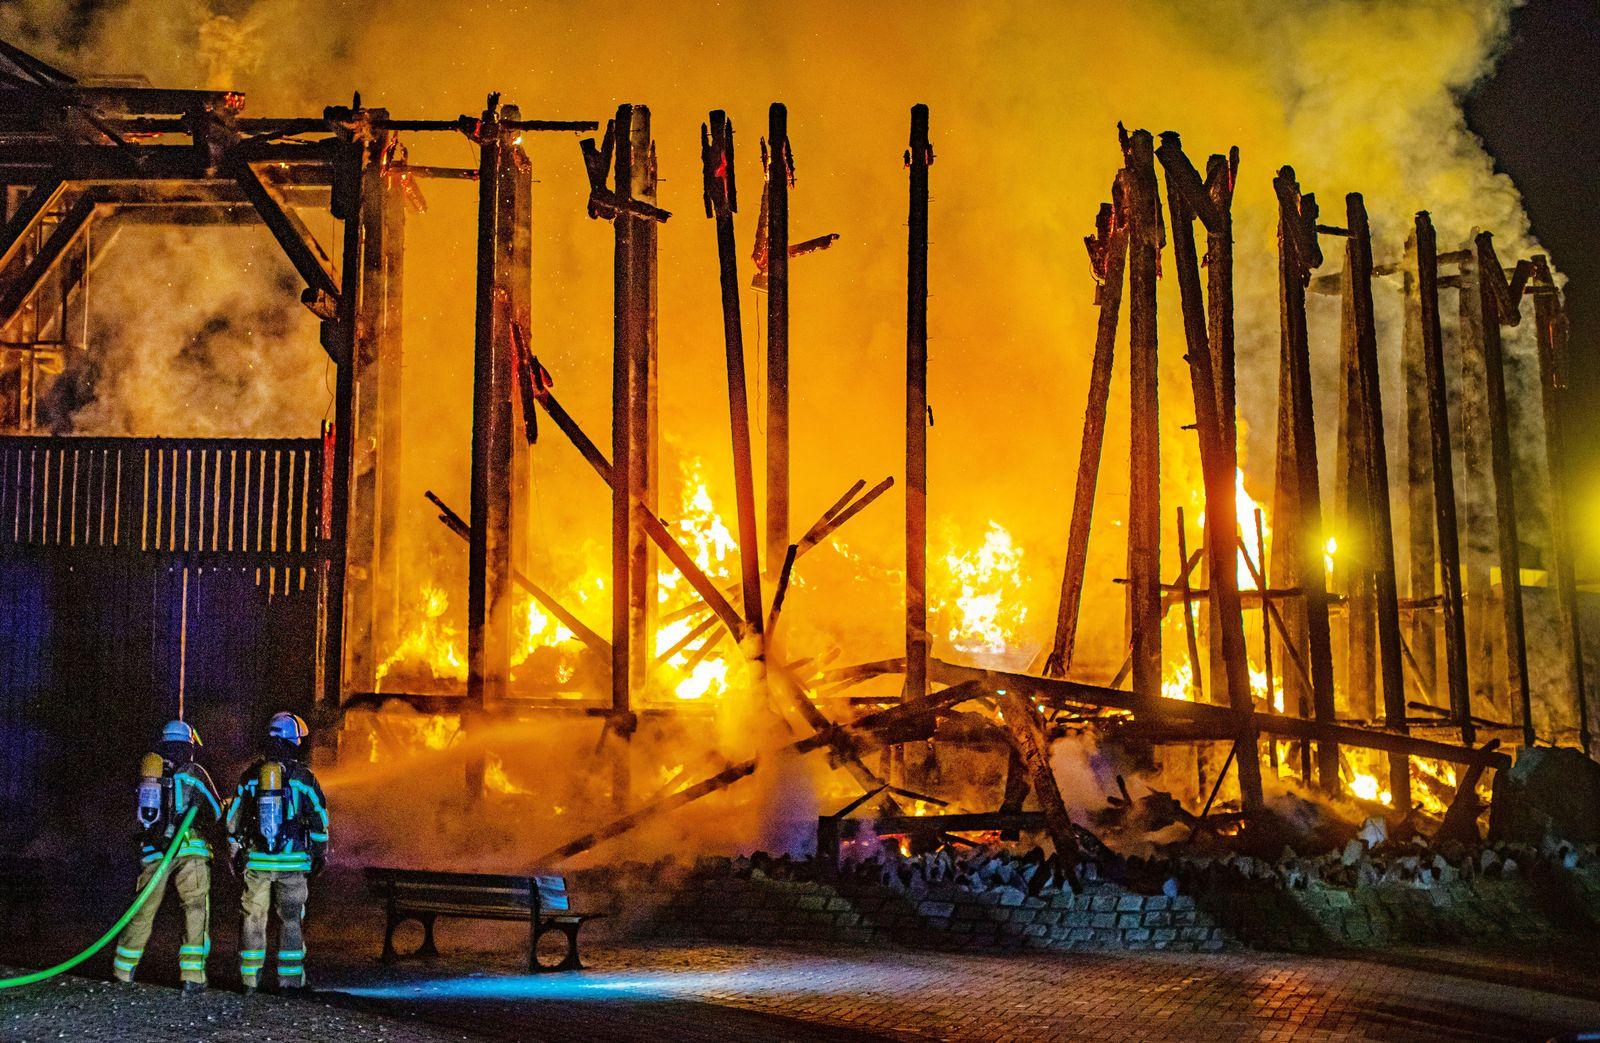 Großbrand in Duisburger Niederrheintherme